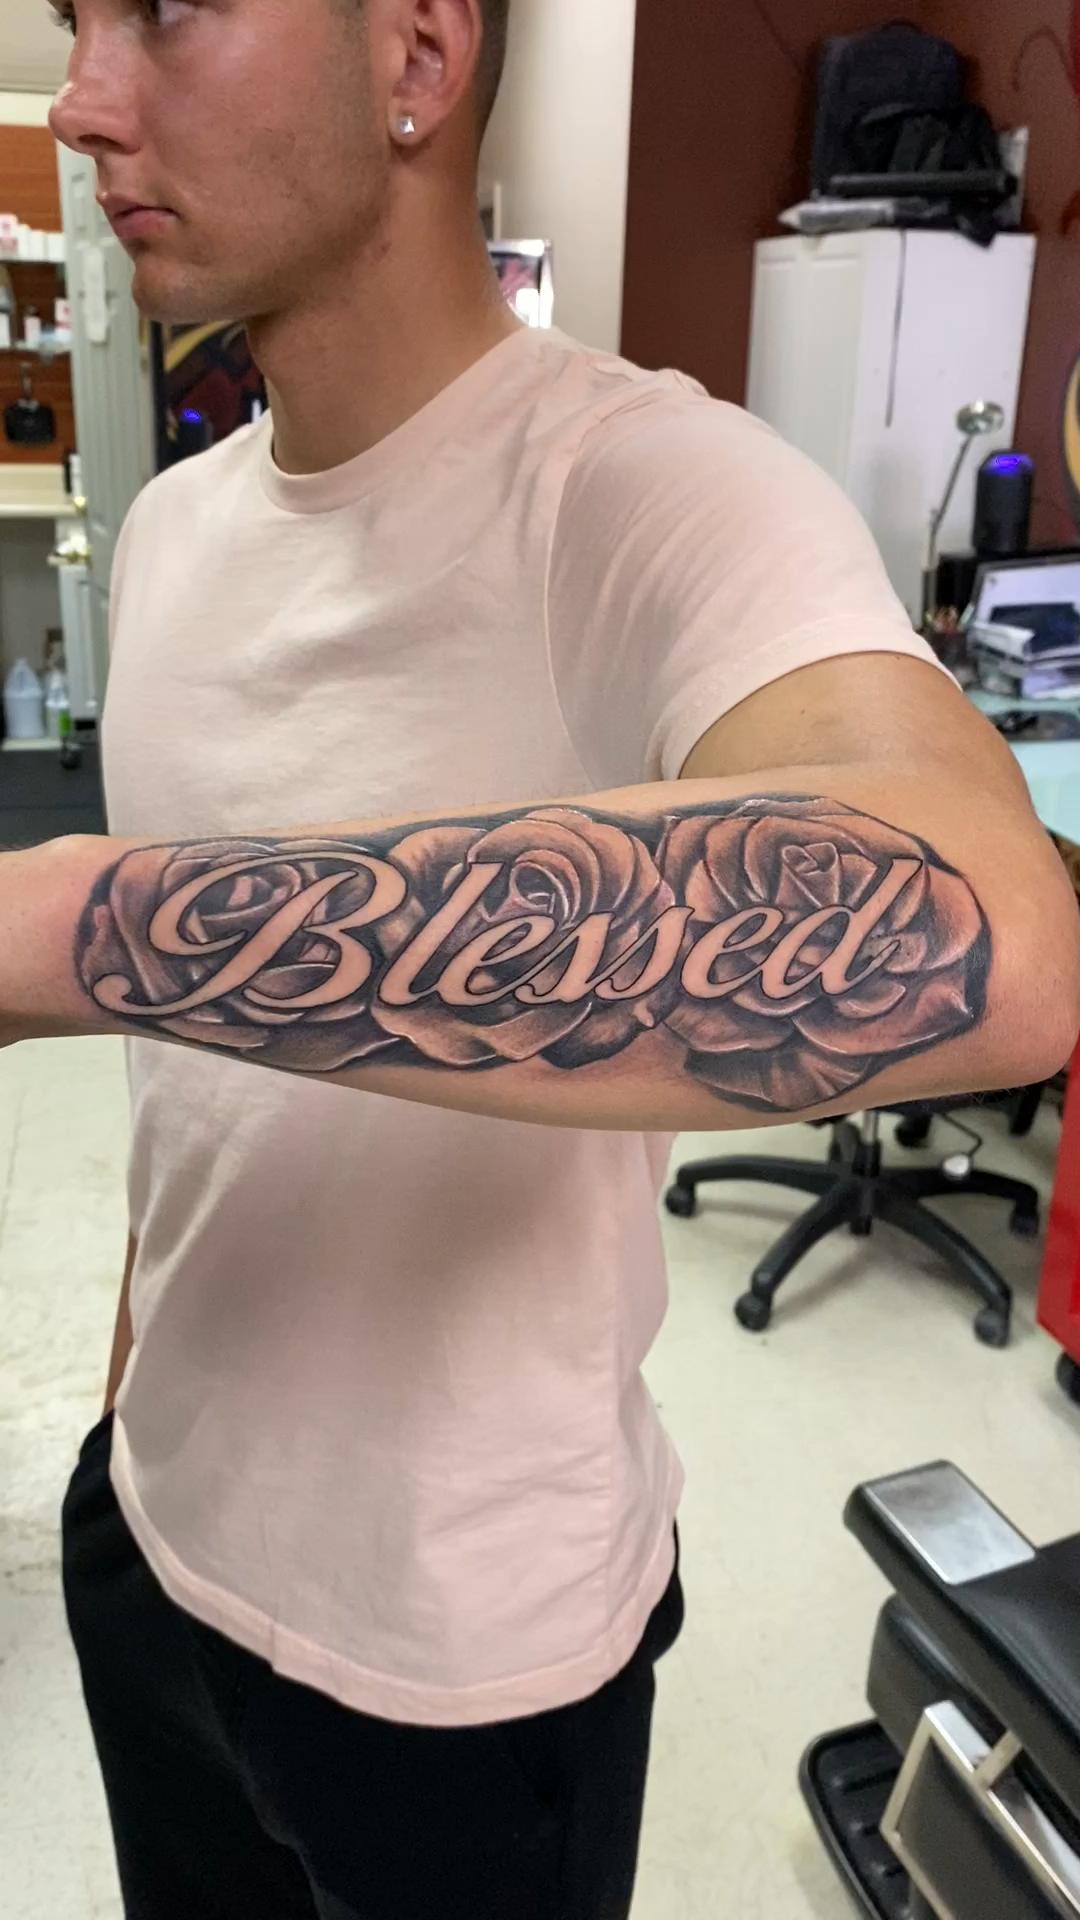 Nose Piercings Mens Forearm Tattoos Words Men Forearm Tattoos Simple Mens Forearm Tattoos Family Mens Forear In 2020 Tattoos Forearm Sleeve Tattoos Chest Tattoo Men